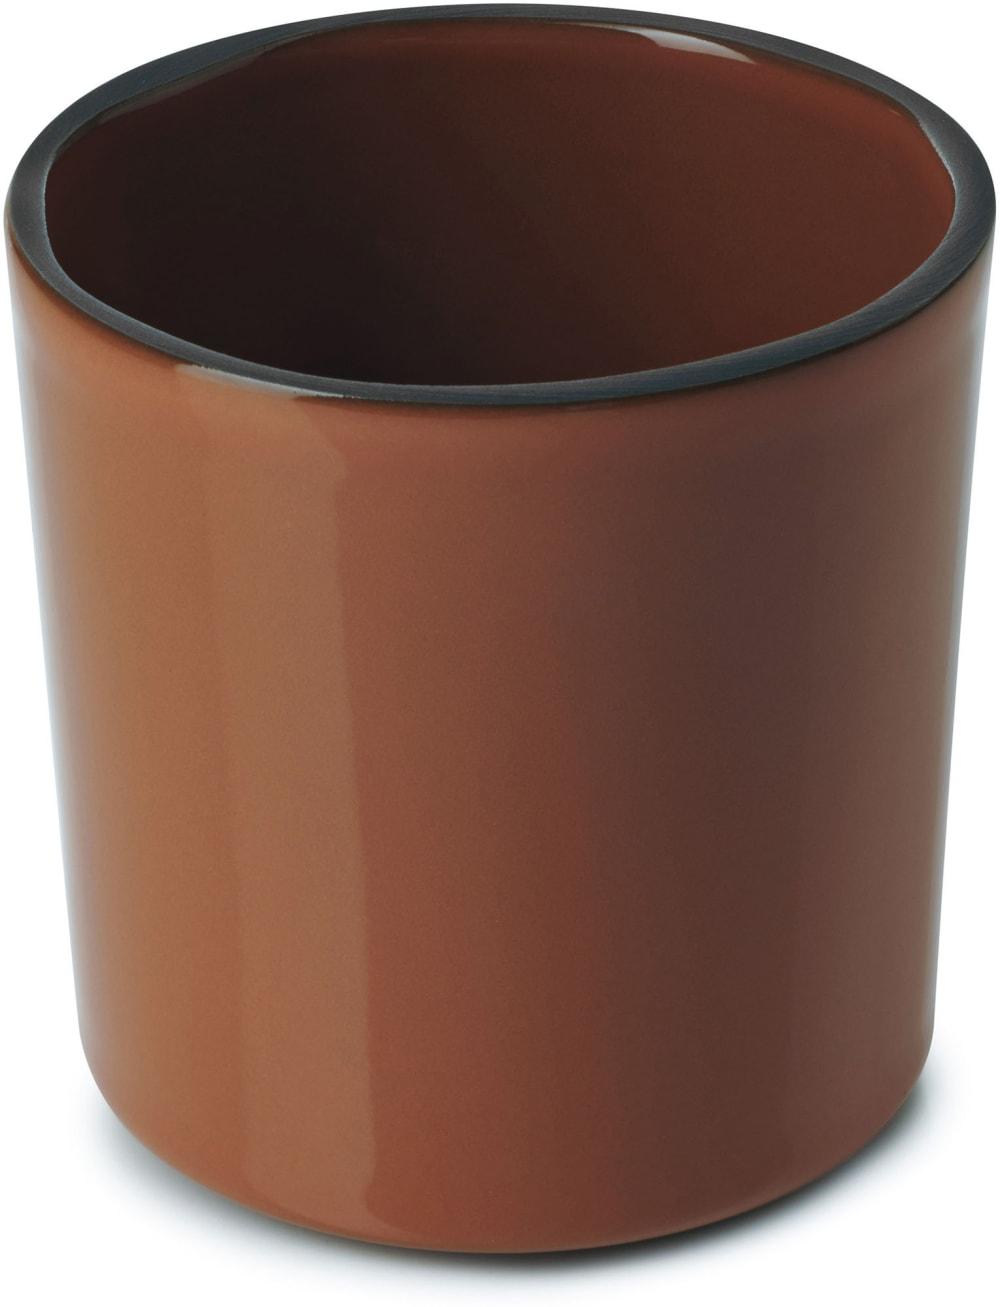 CARACTERE Filiżanka 220 ml Cynamon